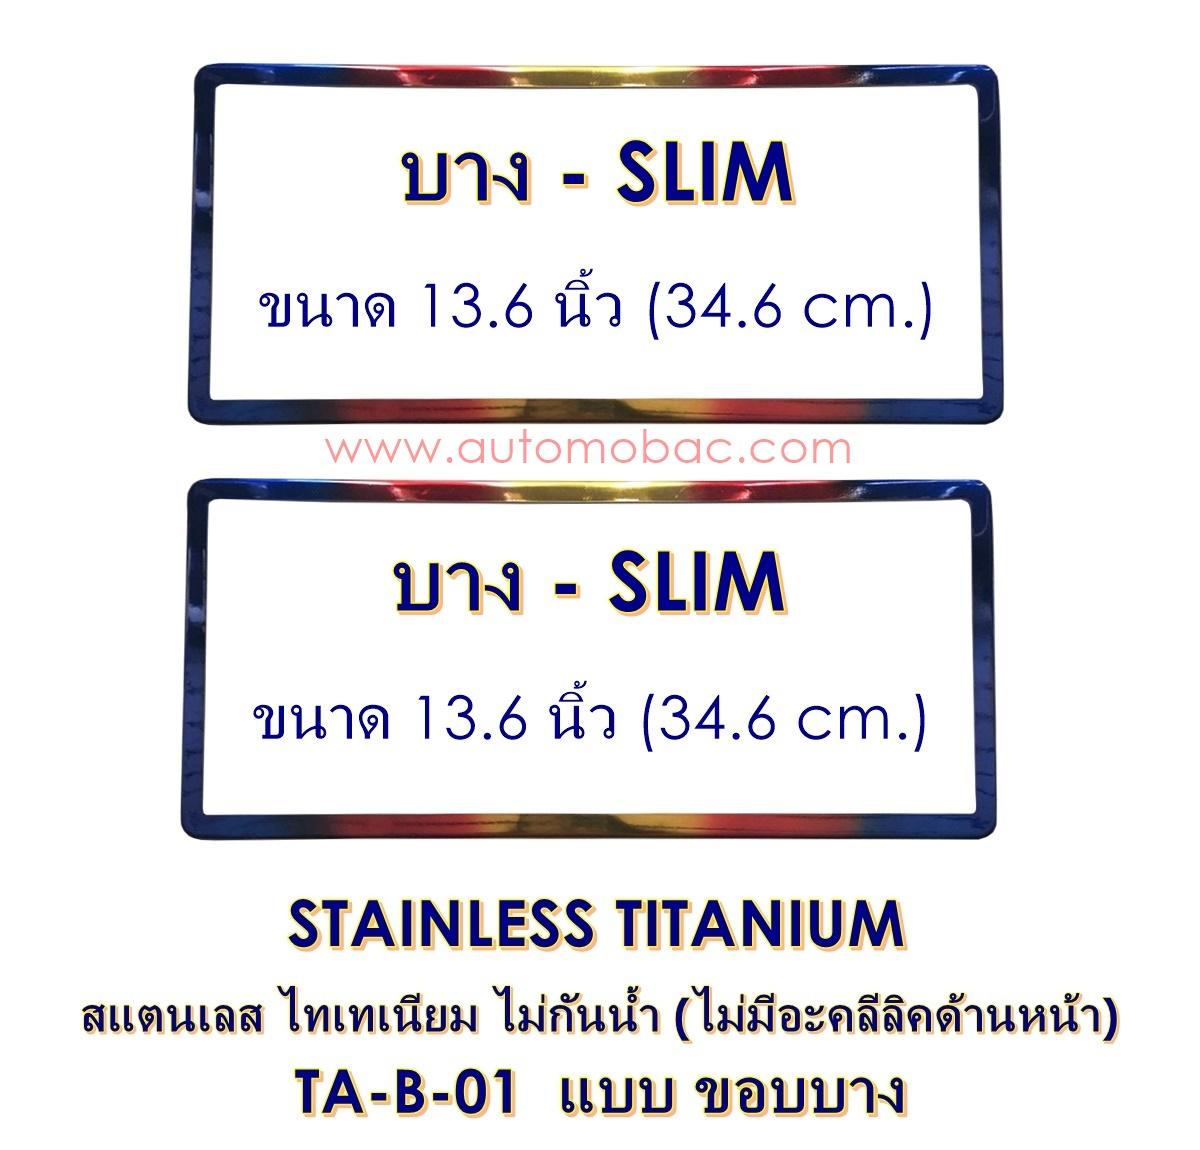 STAINLESS TITANIUM กรอบป้าย ไม่กันน้ำ TA-B-01 SLIM ขอบบาง 2 ชิ้น สแตนเลส ไทเทเนียม สวยไม่ซ้ำใคร